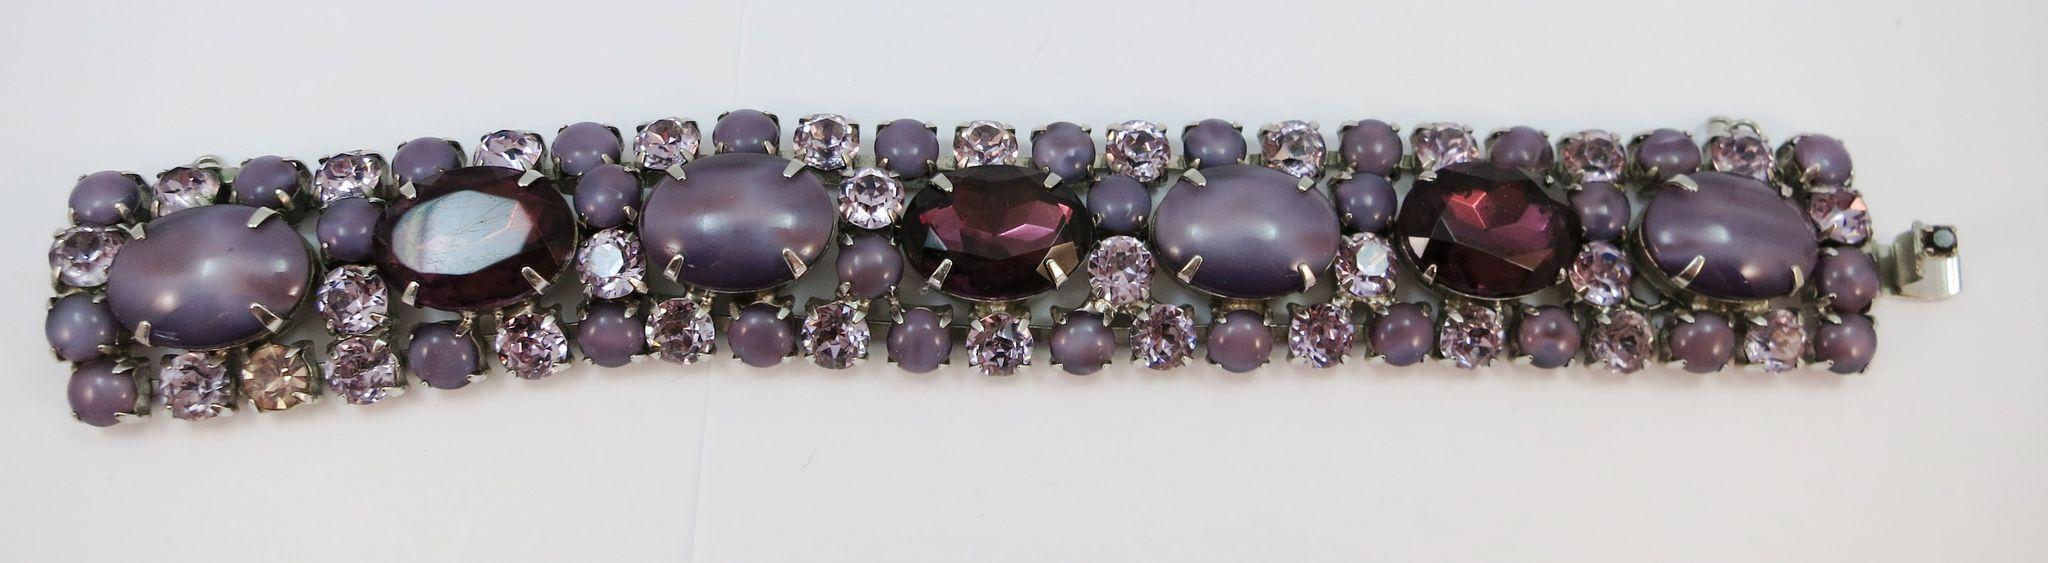 VINTAGE 70's  Purplish Rhinestone Bracelet   7 Inch